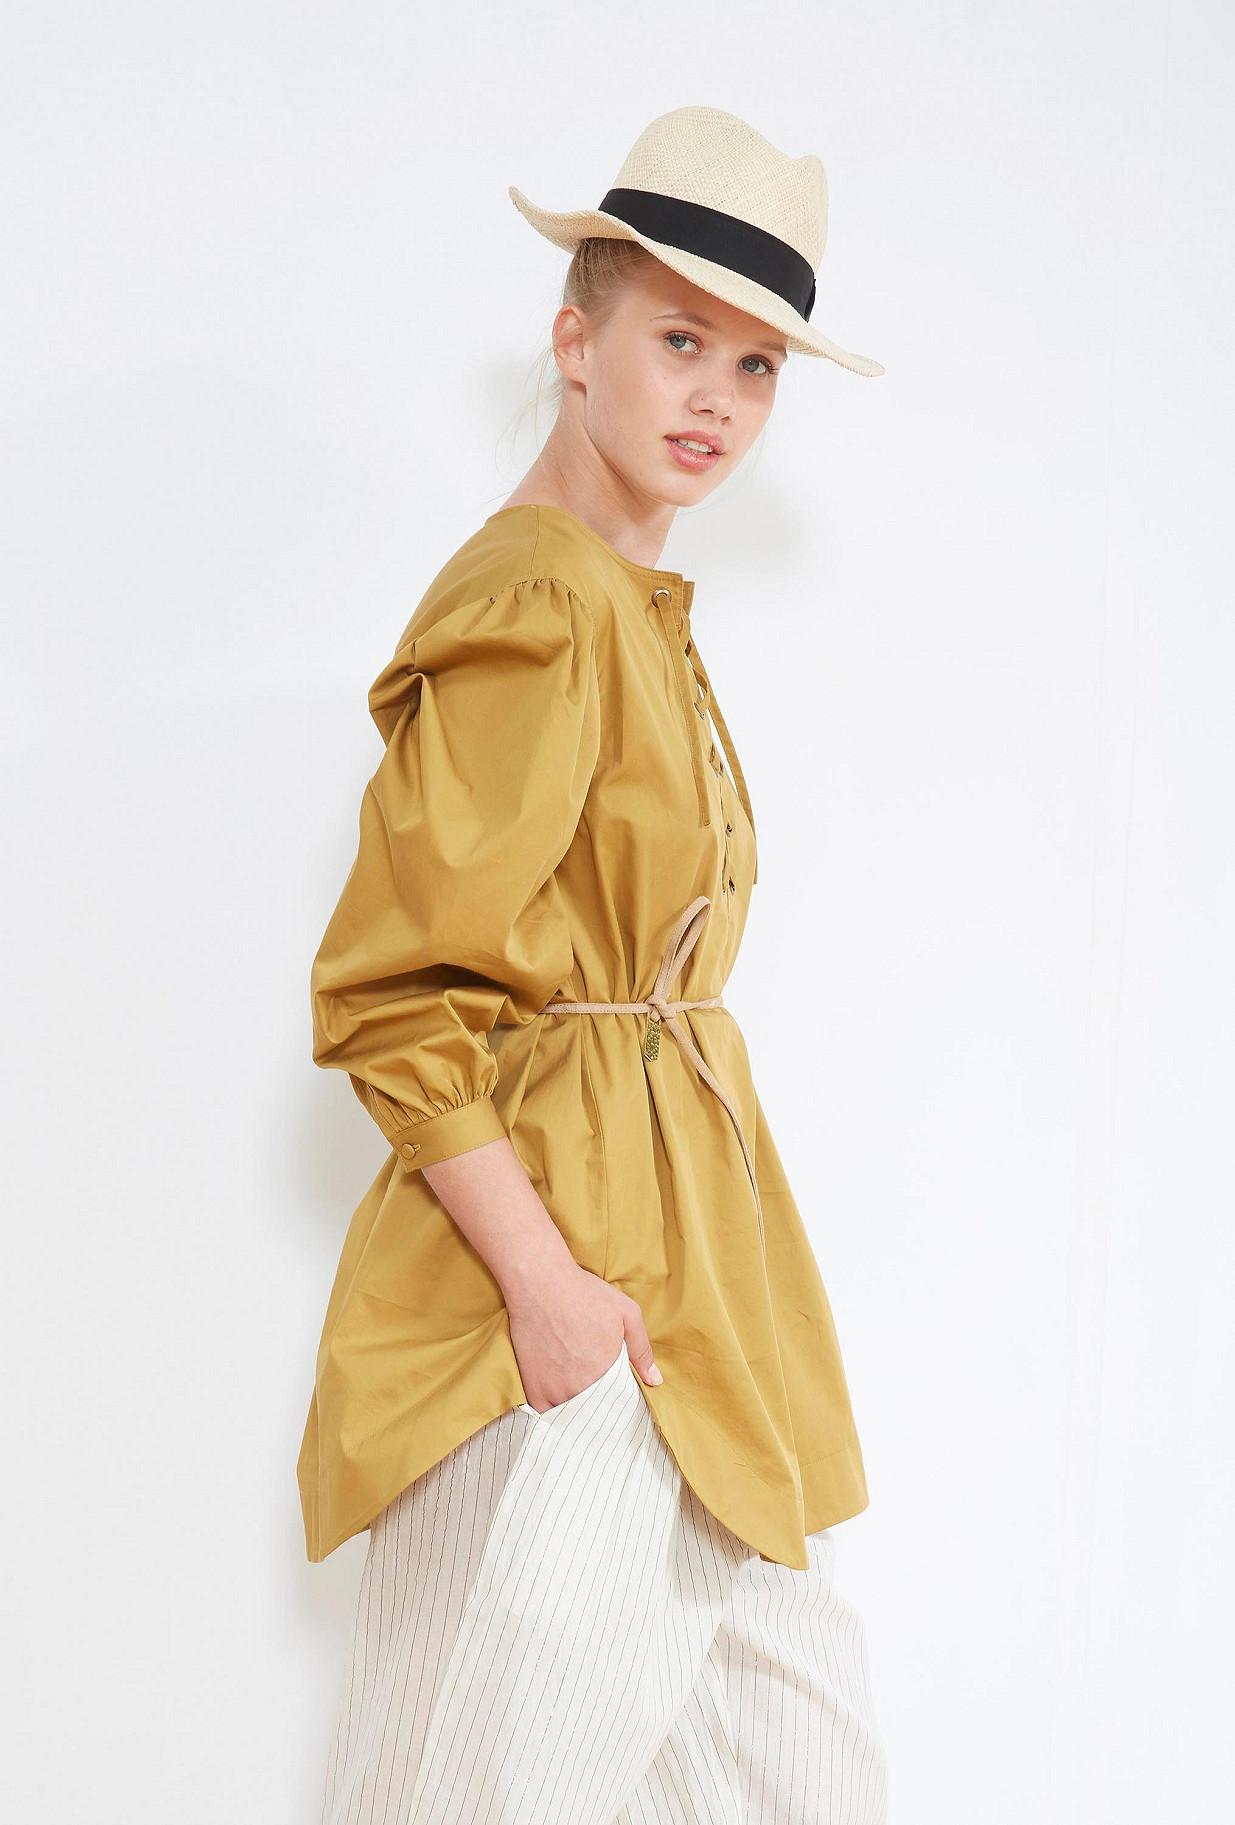 tienda de ropa BLUSA Hopper Paris